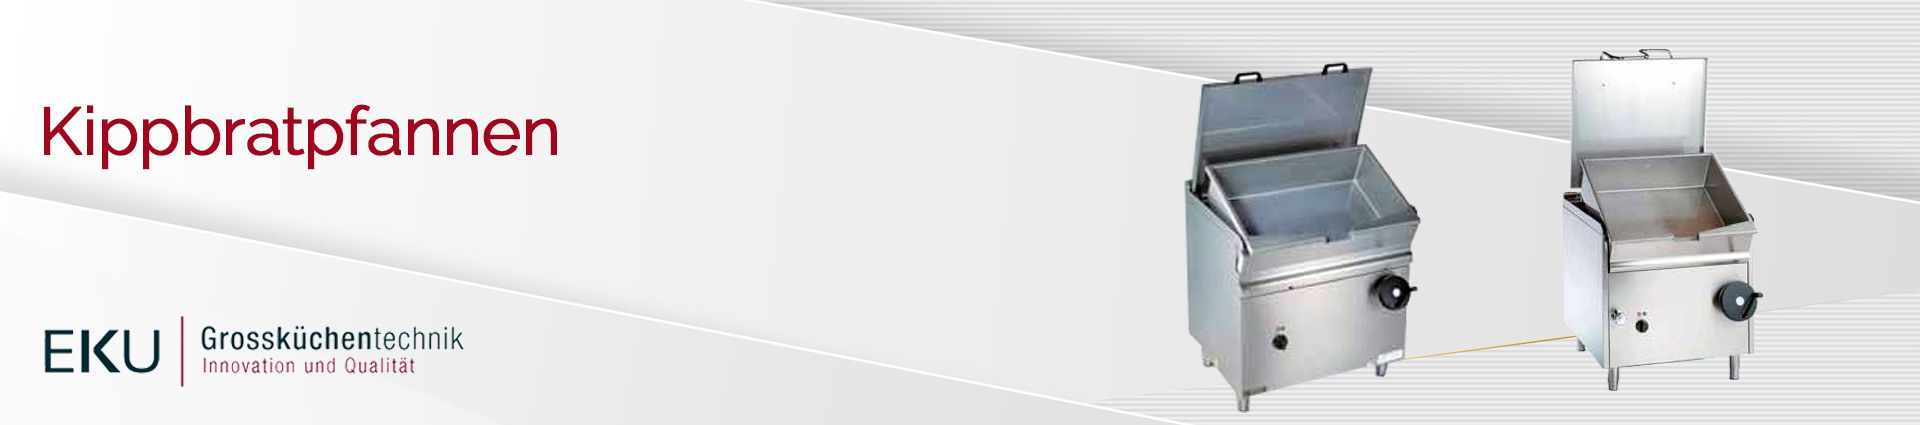 EKU Kippbratpfannen Banner